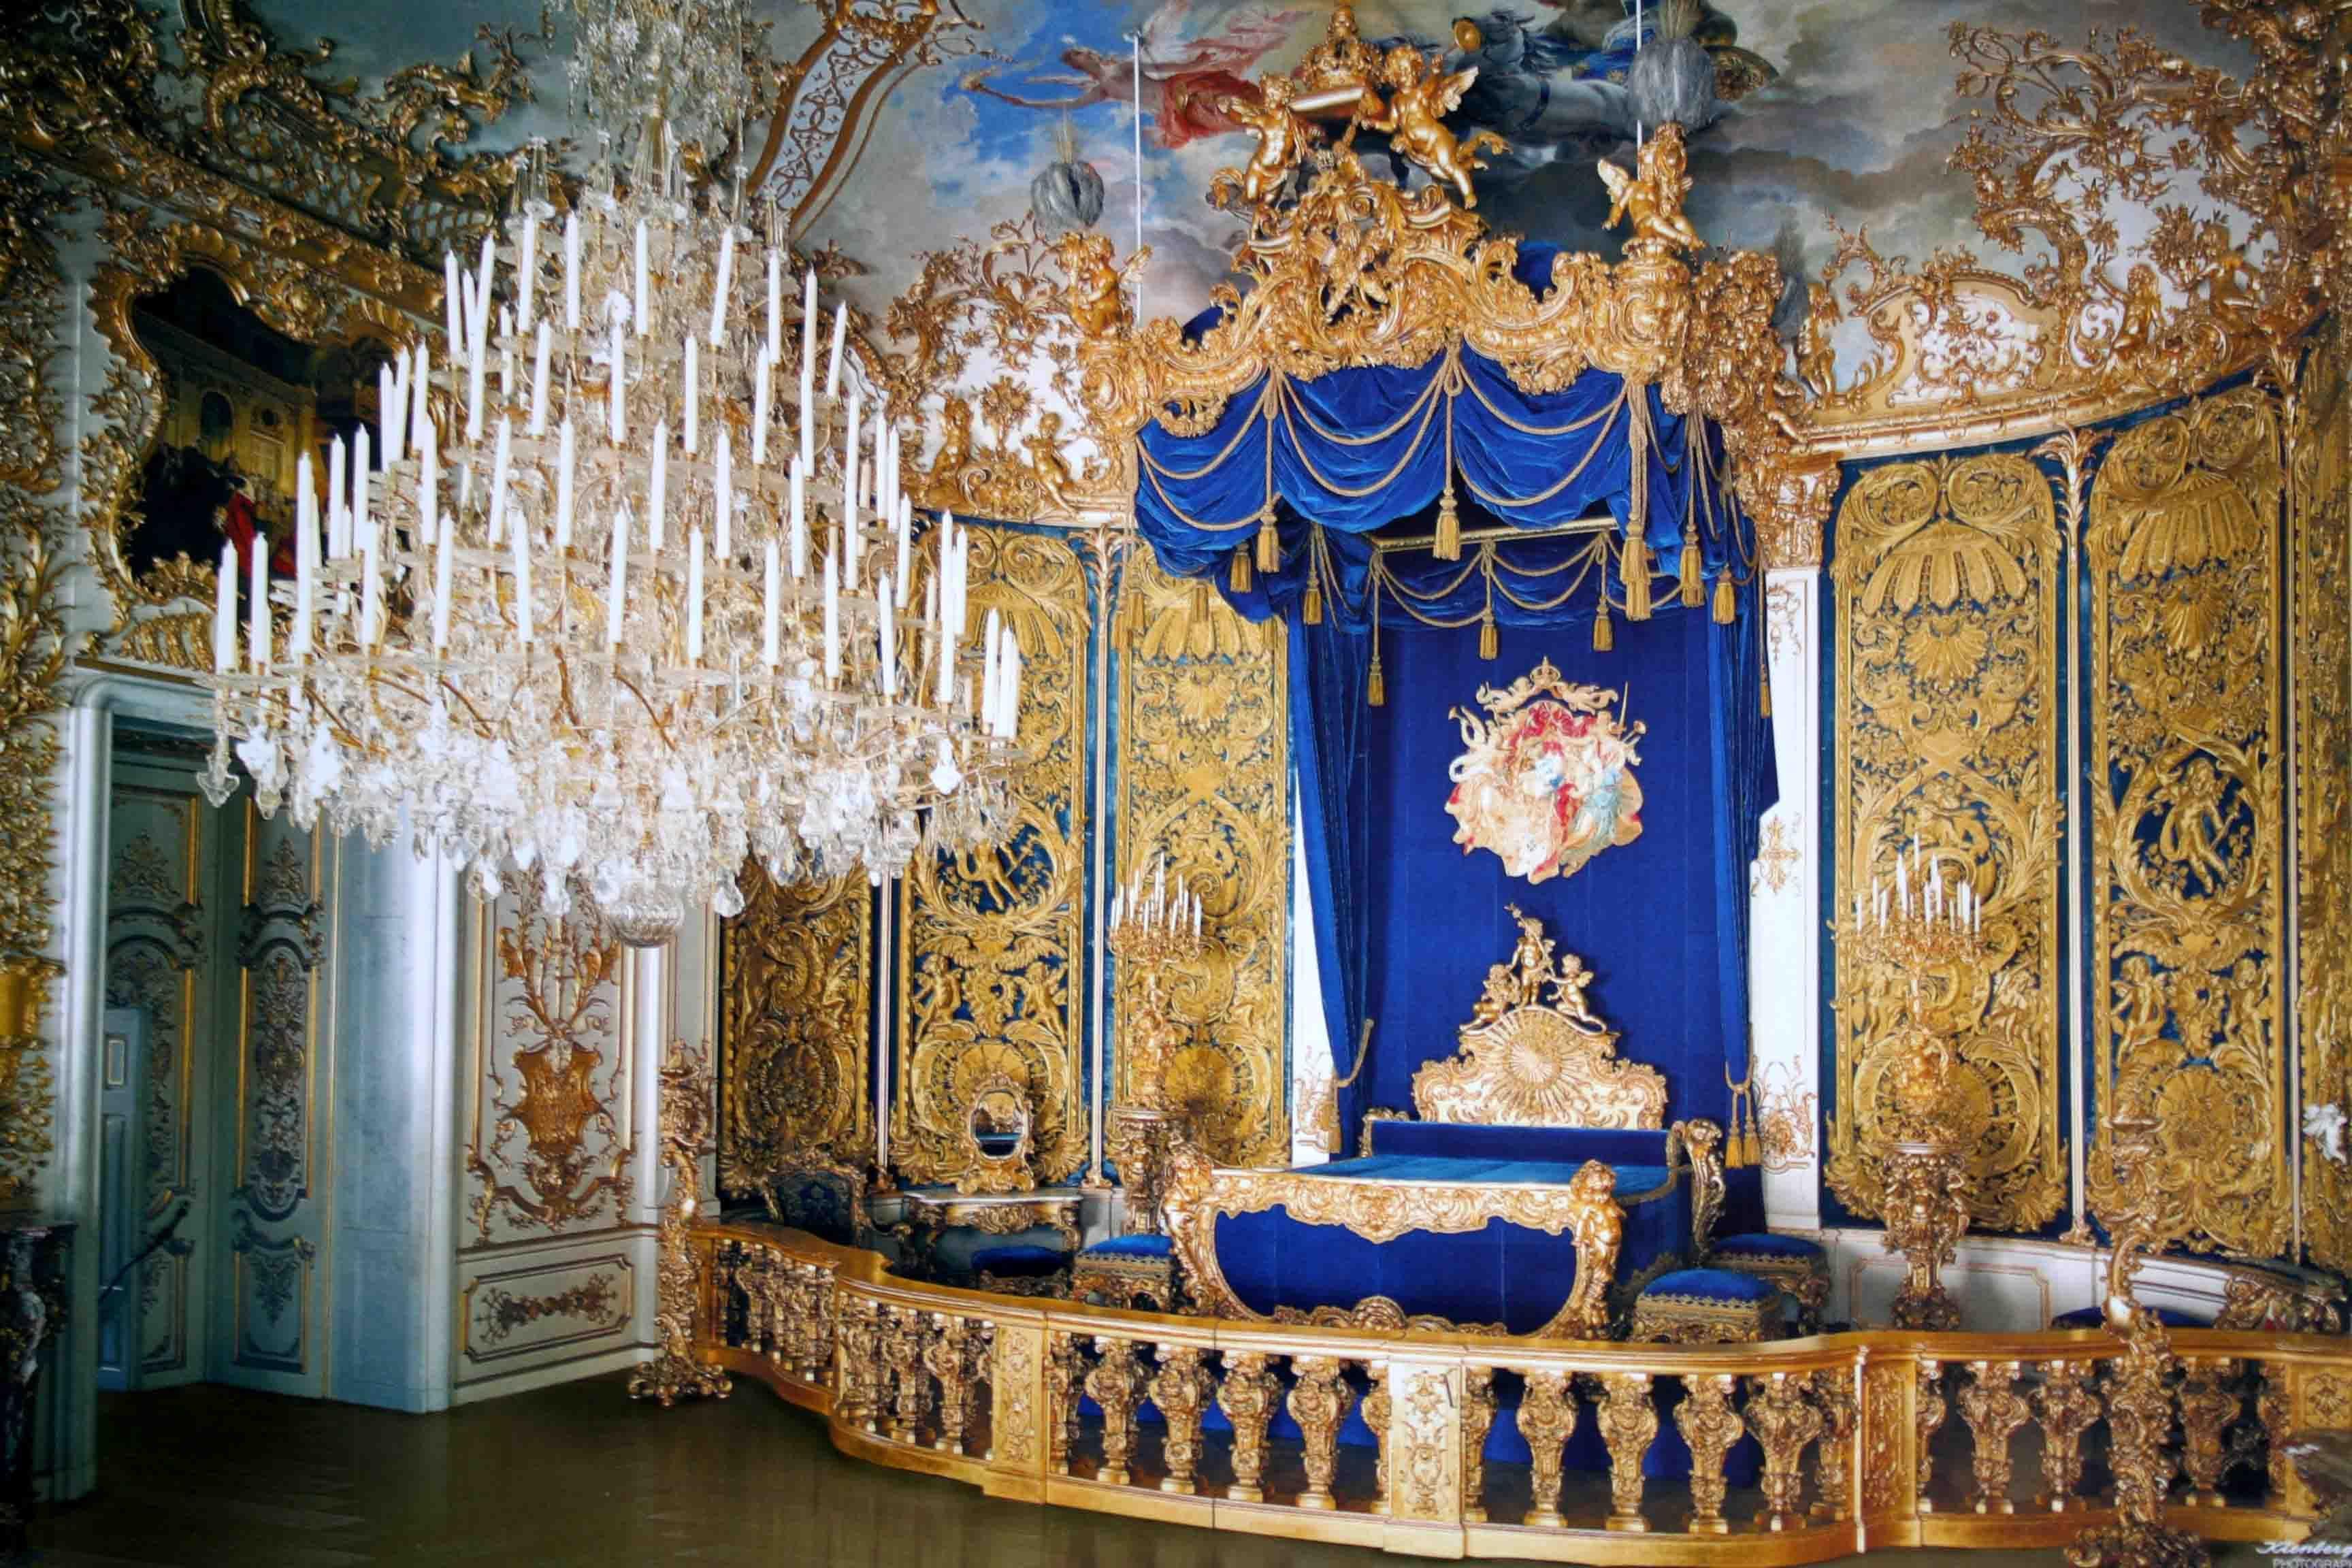 Schloss Neuschwanstein C P Vagners Castles Interior Royal Castles Germany Castles